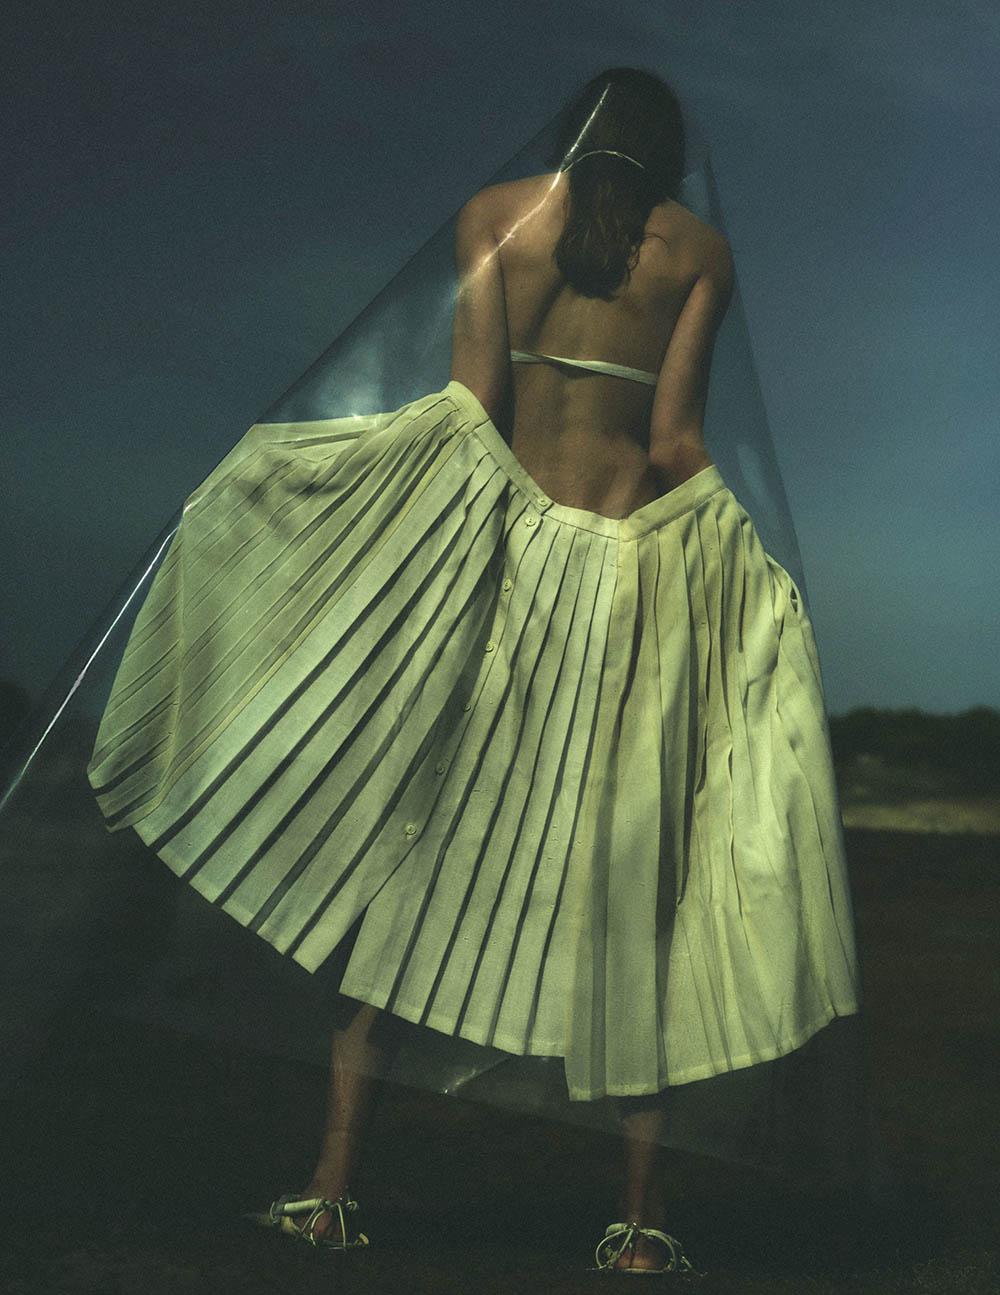 Amber Valletta covers Vogue Netherlands July August 2020 by Annemarieke van Drimmelen